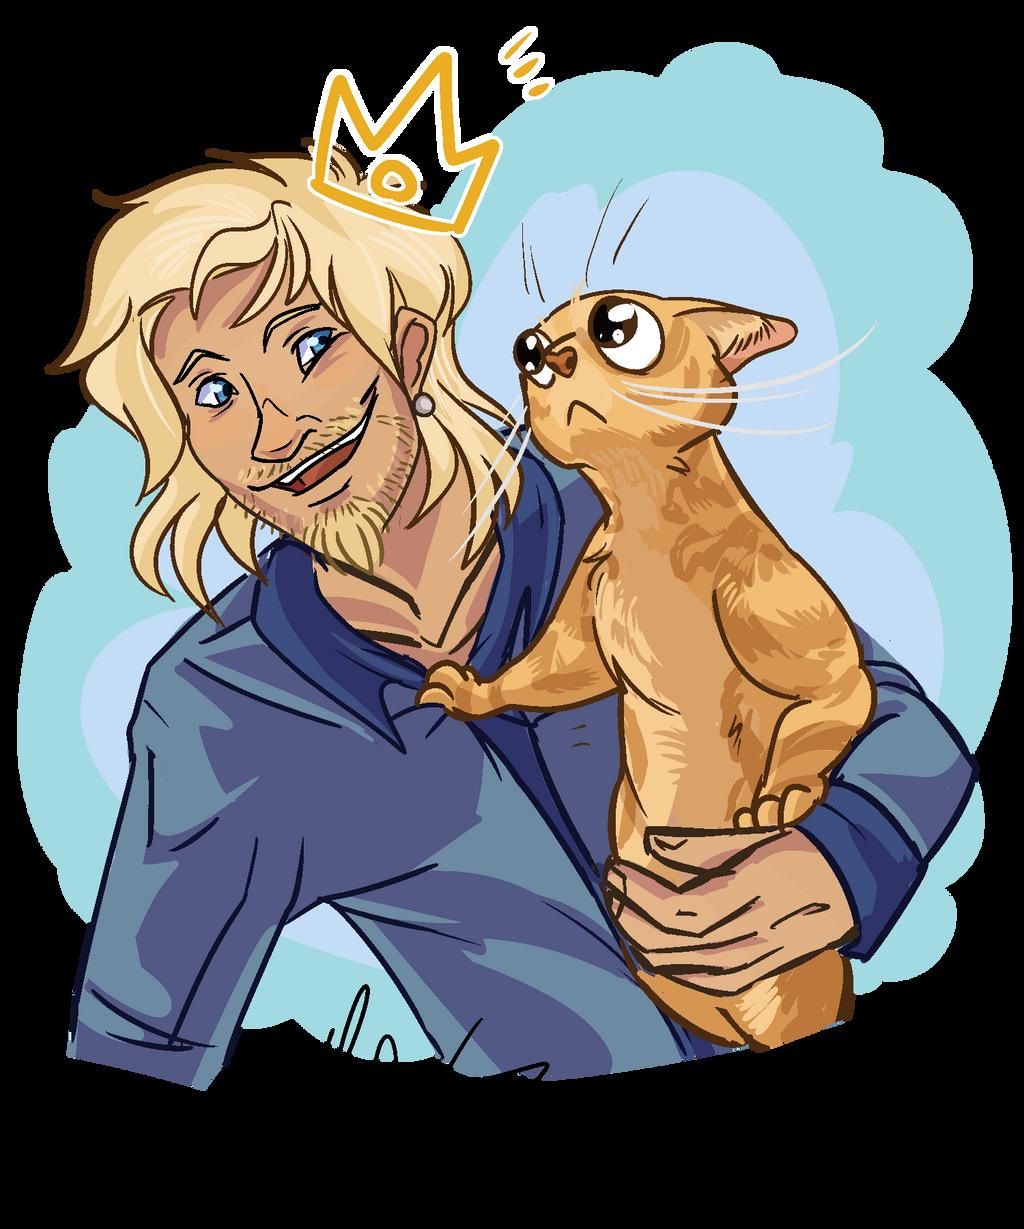 Xmas 2016 - The true pi-prince by Louaseau